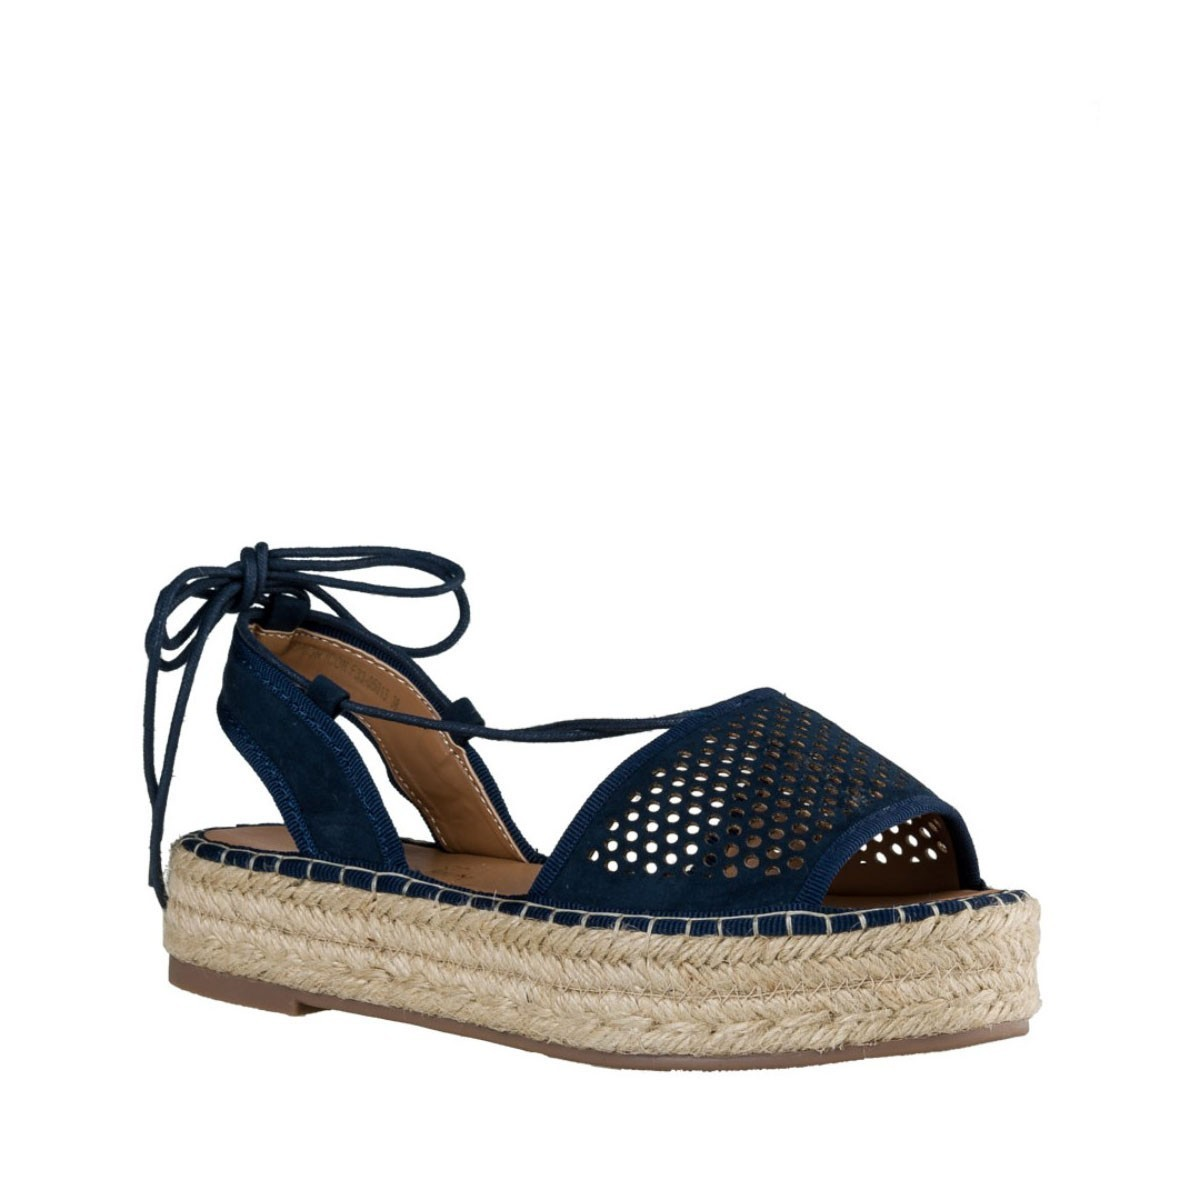 Fashion Icon Γυναικεία Παπούτσια Πέδιλα F33-05013 Μπλε